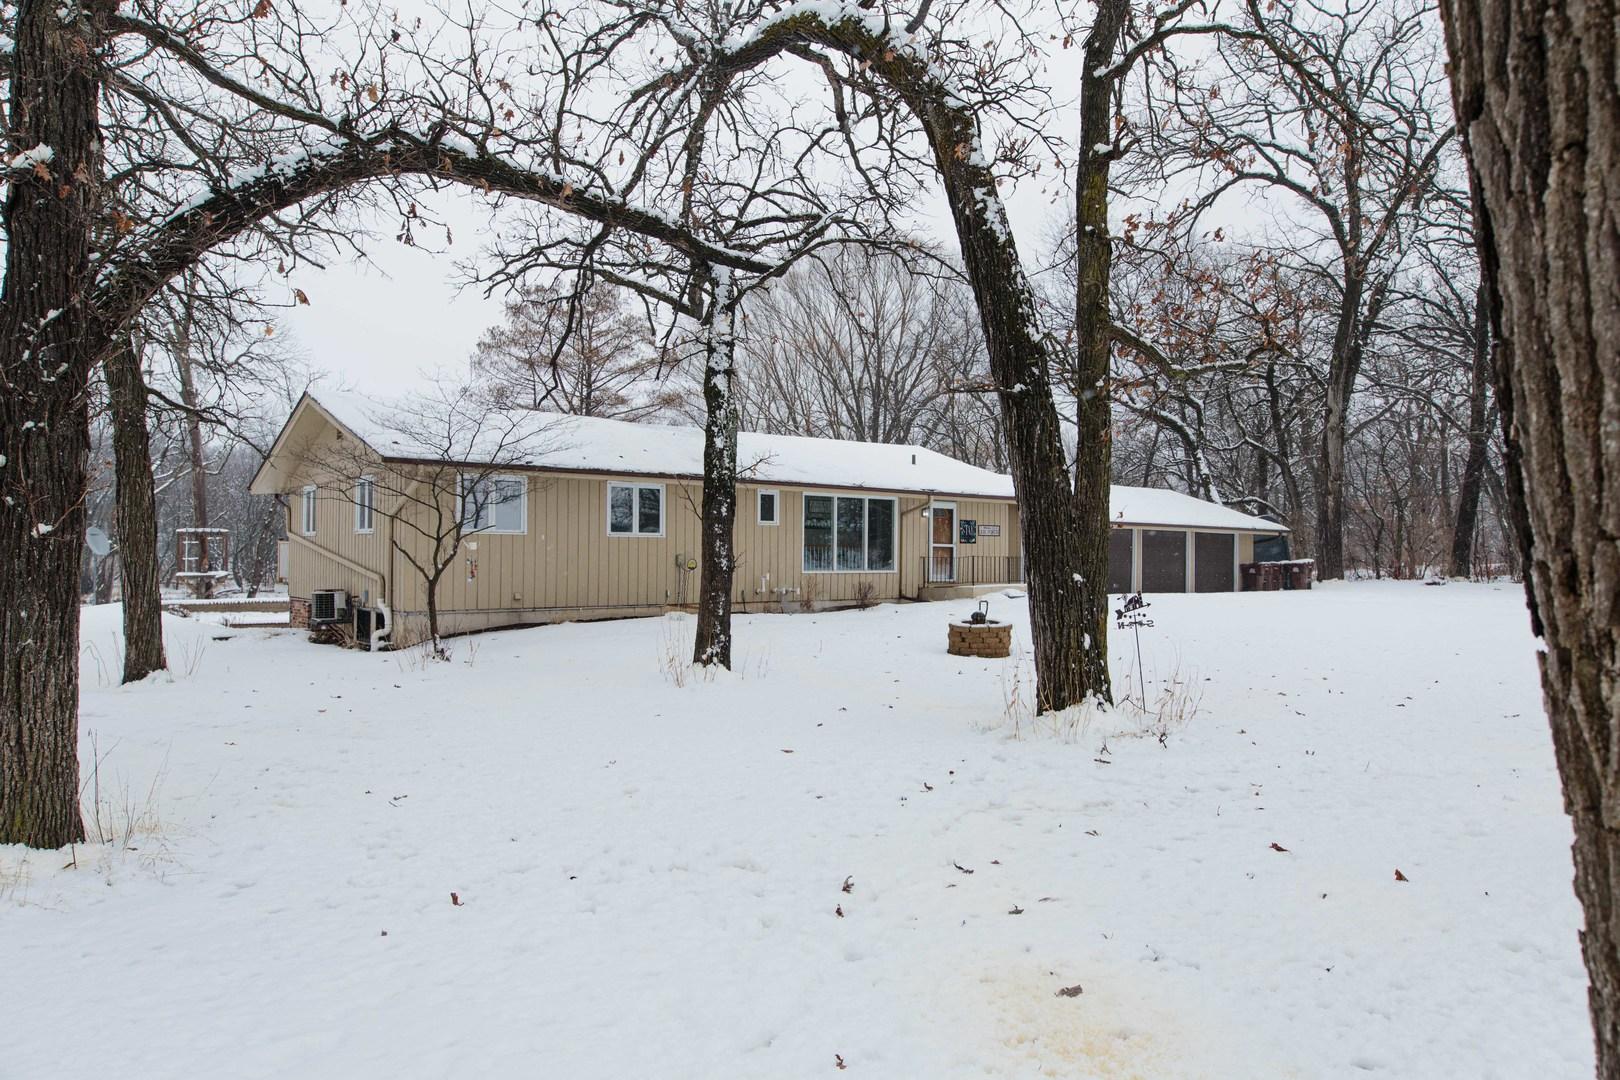 35404 West County Line, Kirkland, Illinois, 60146